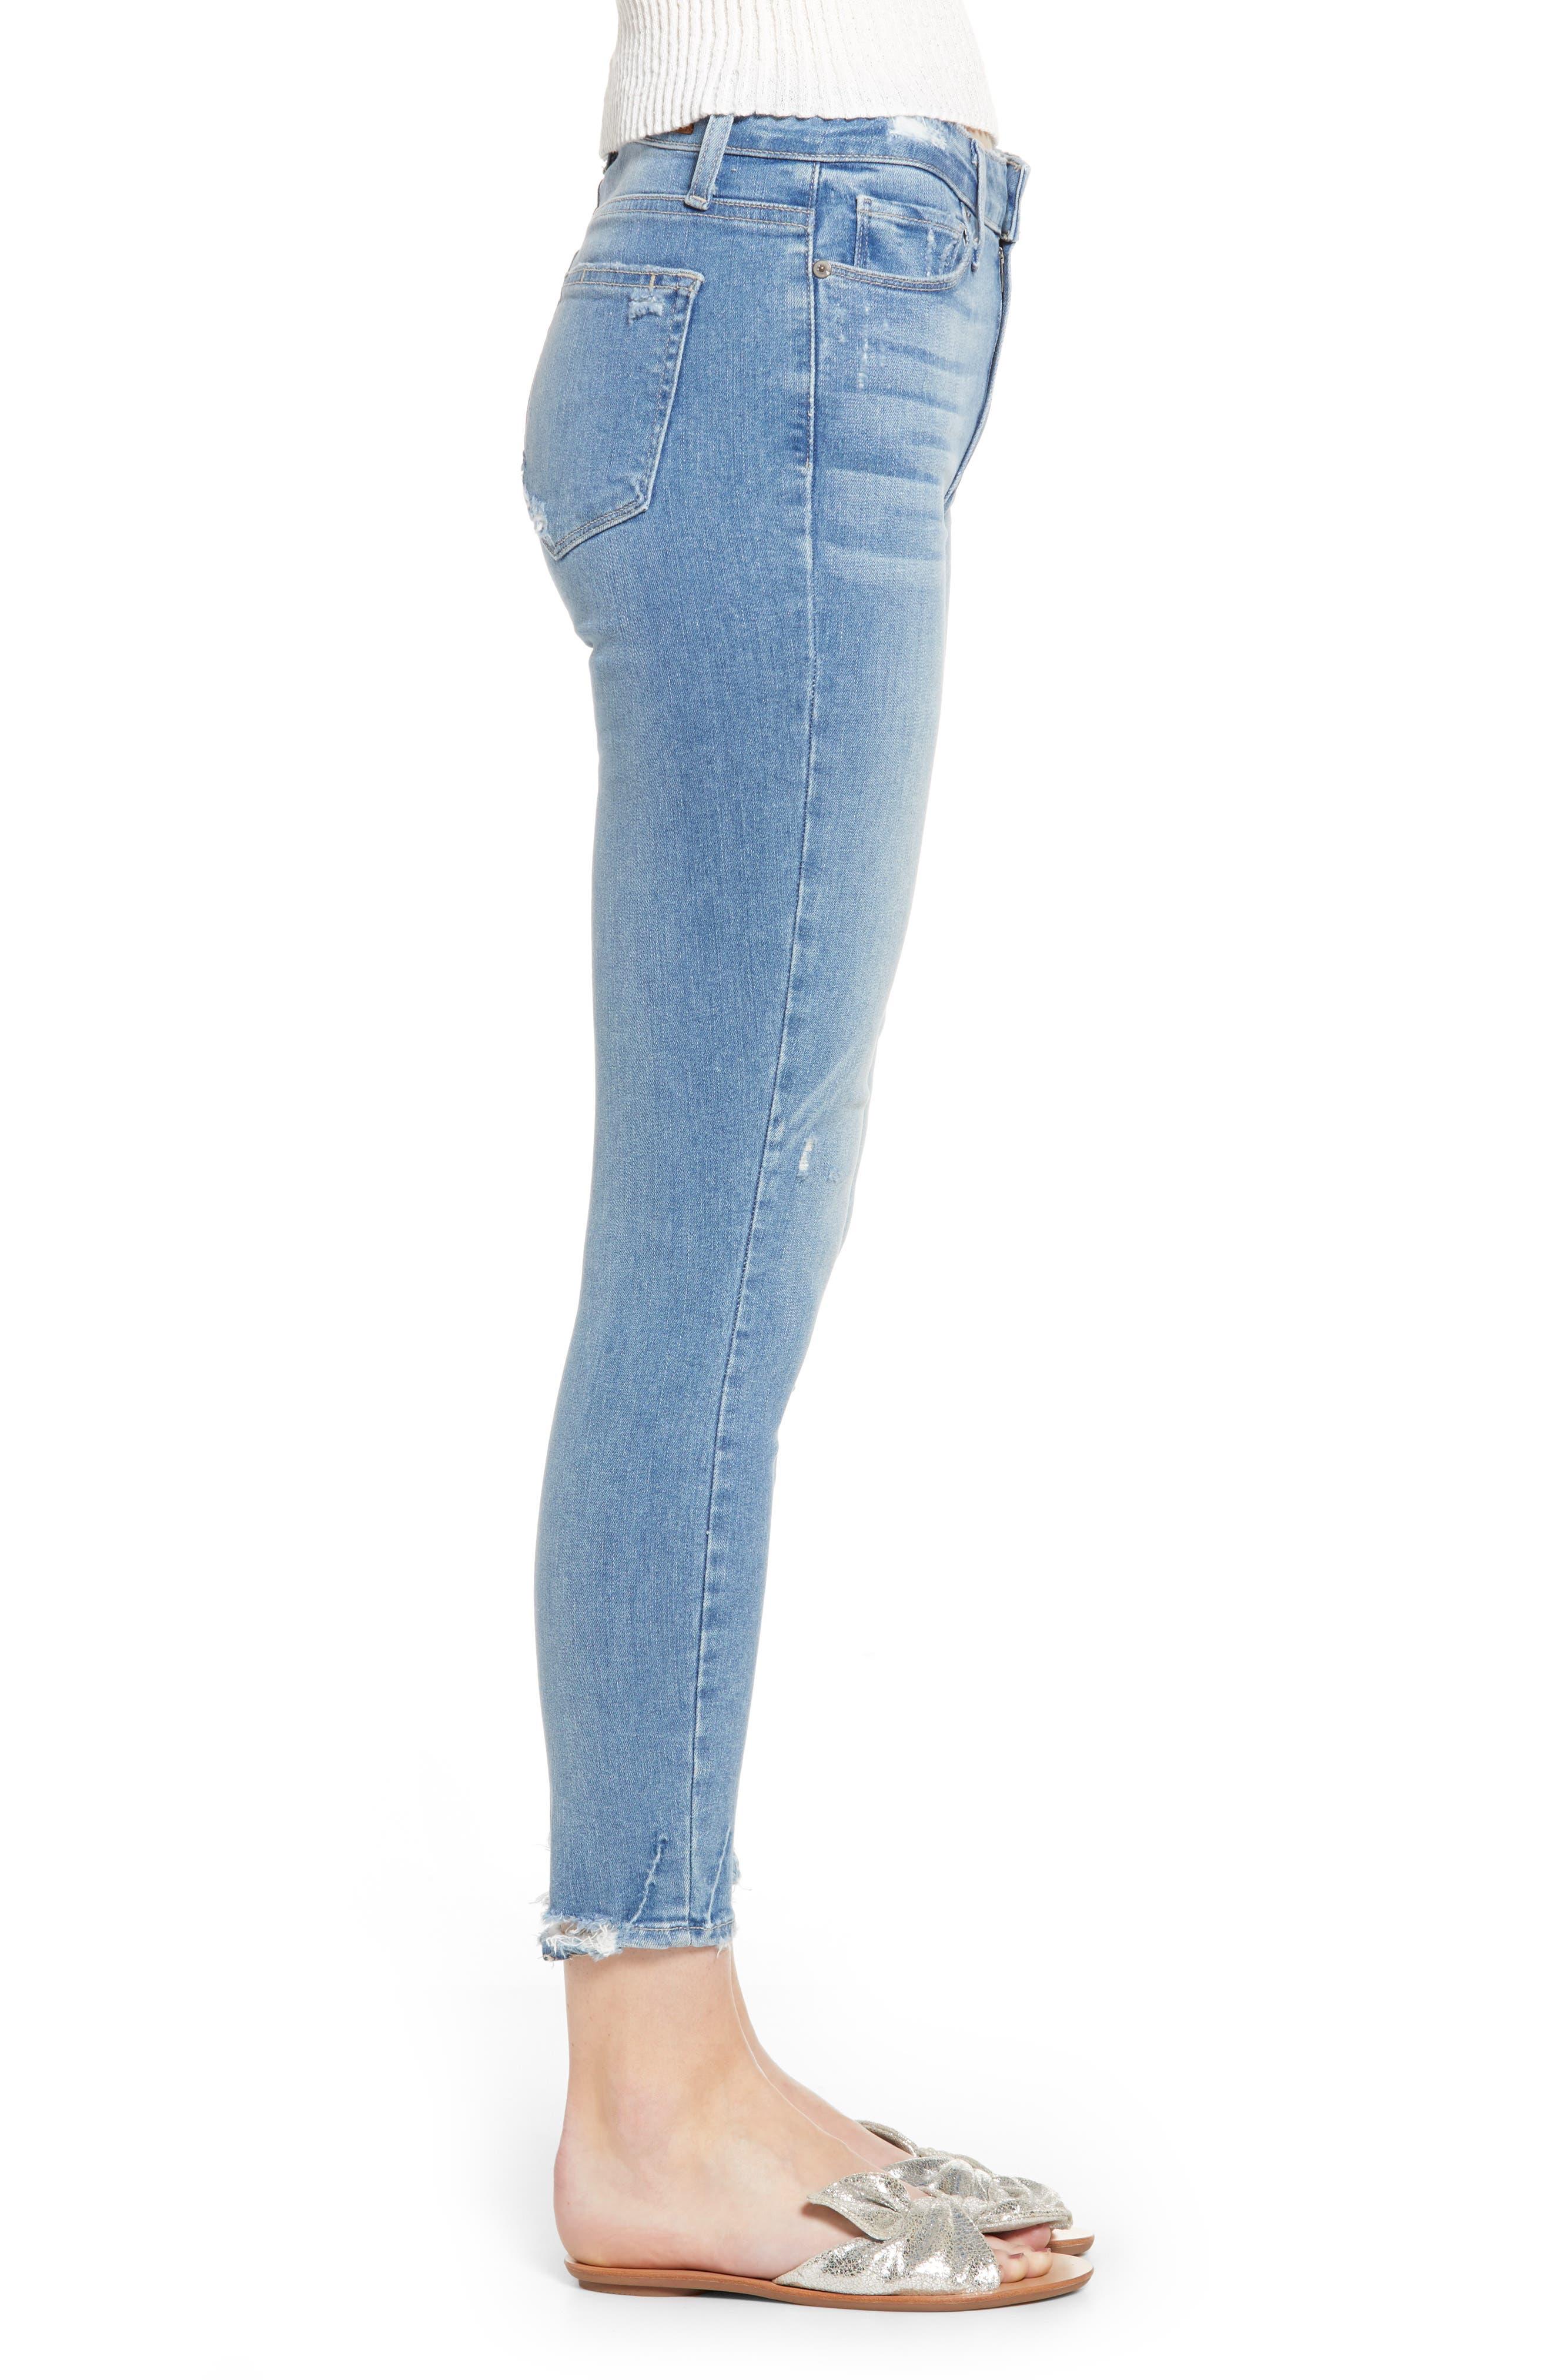 PAIGE, Hoxton Transcend Vintage High Waist Crop Skinny Jeans, Alternate thumbnail 4, color, ATTERBURY W/ TORN BACK HEM